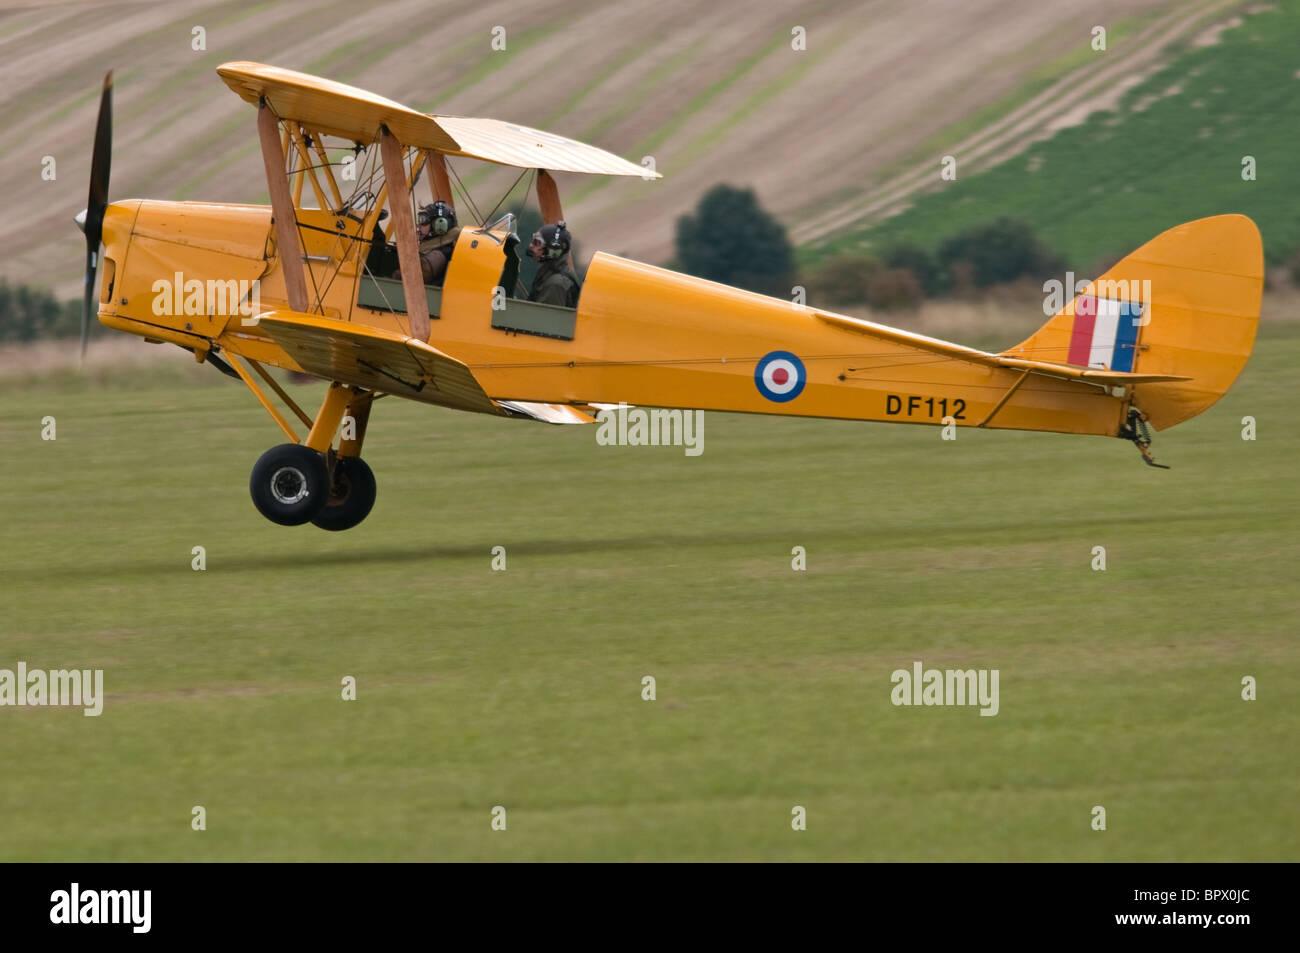 de Havilland DH 82 Tiger Moth landing at Duxford - Stock Image